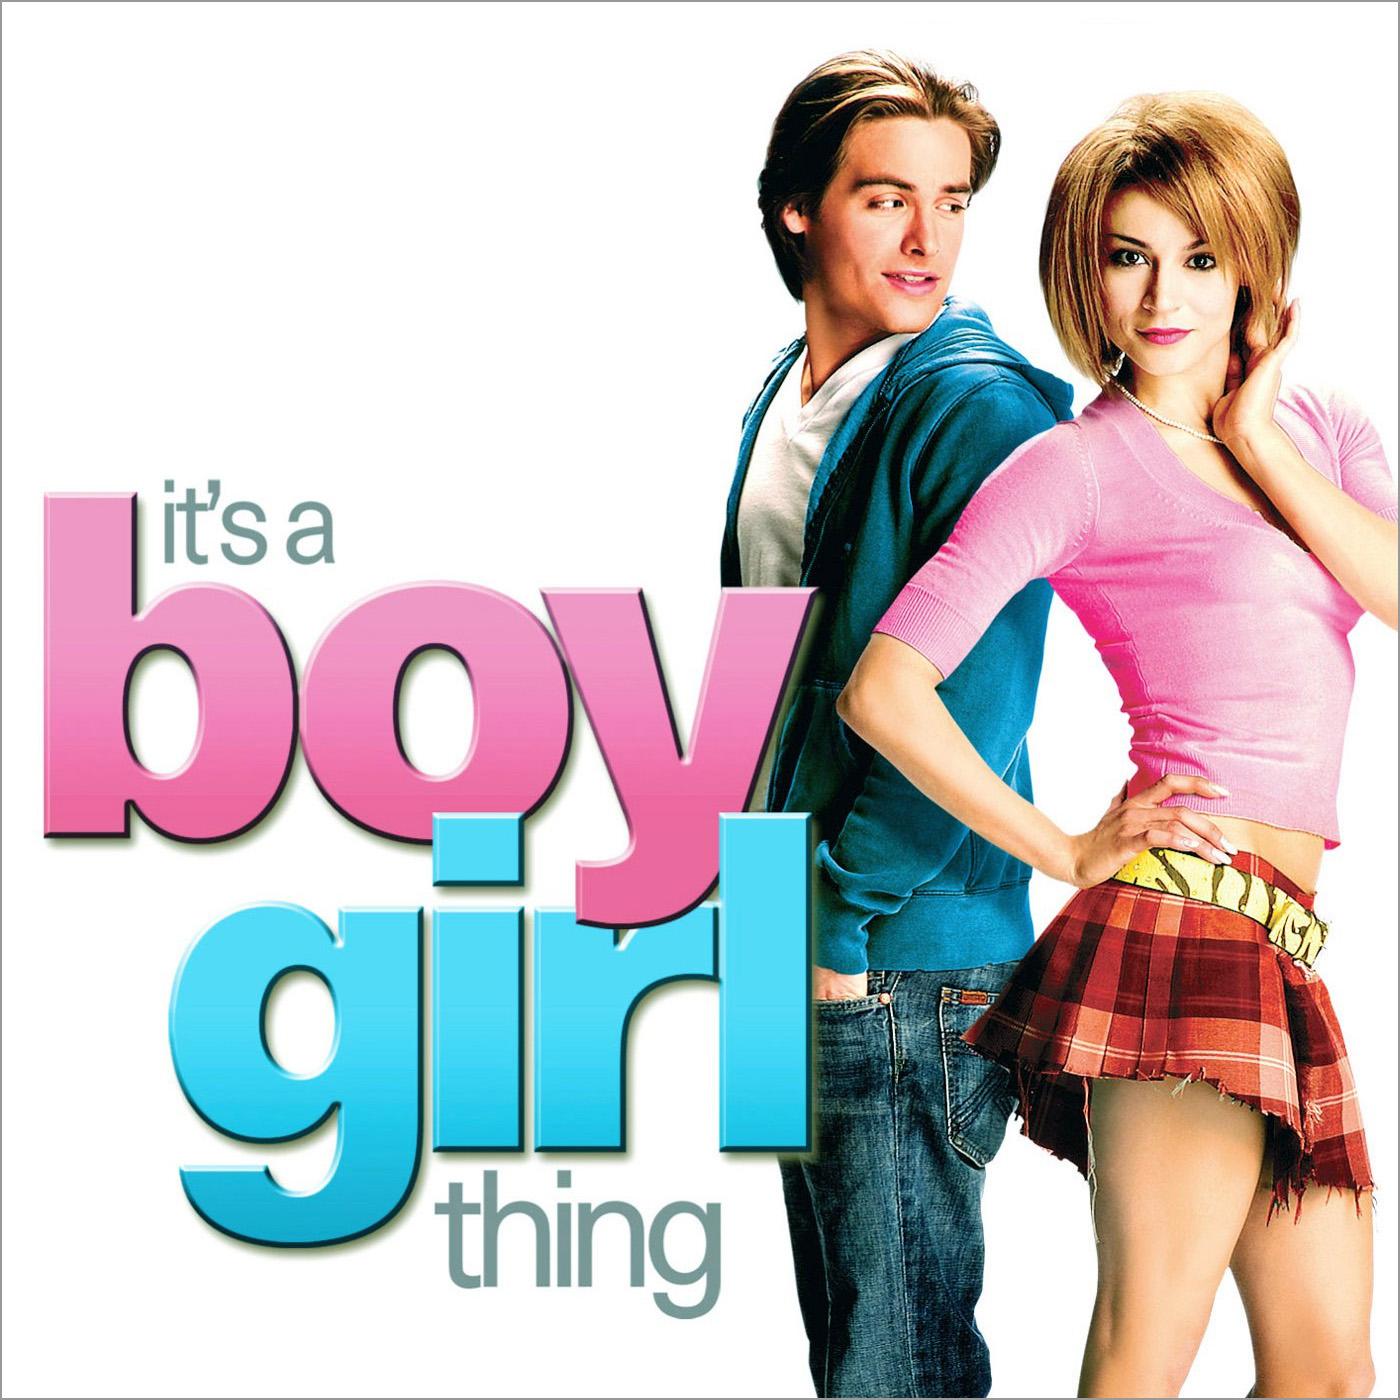 It's a boy girl thing.jpg